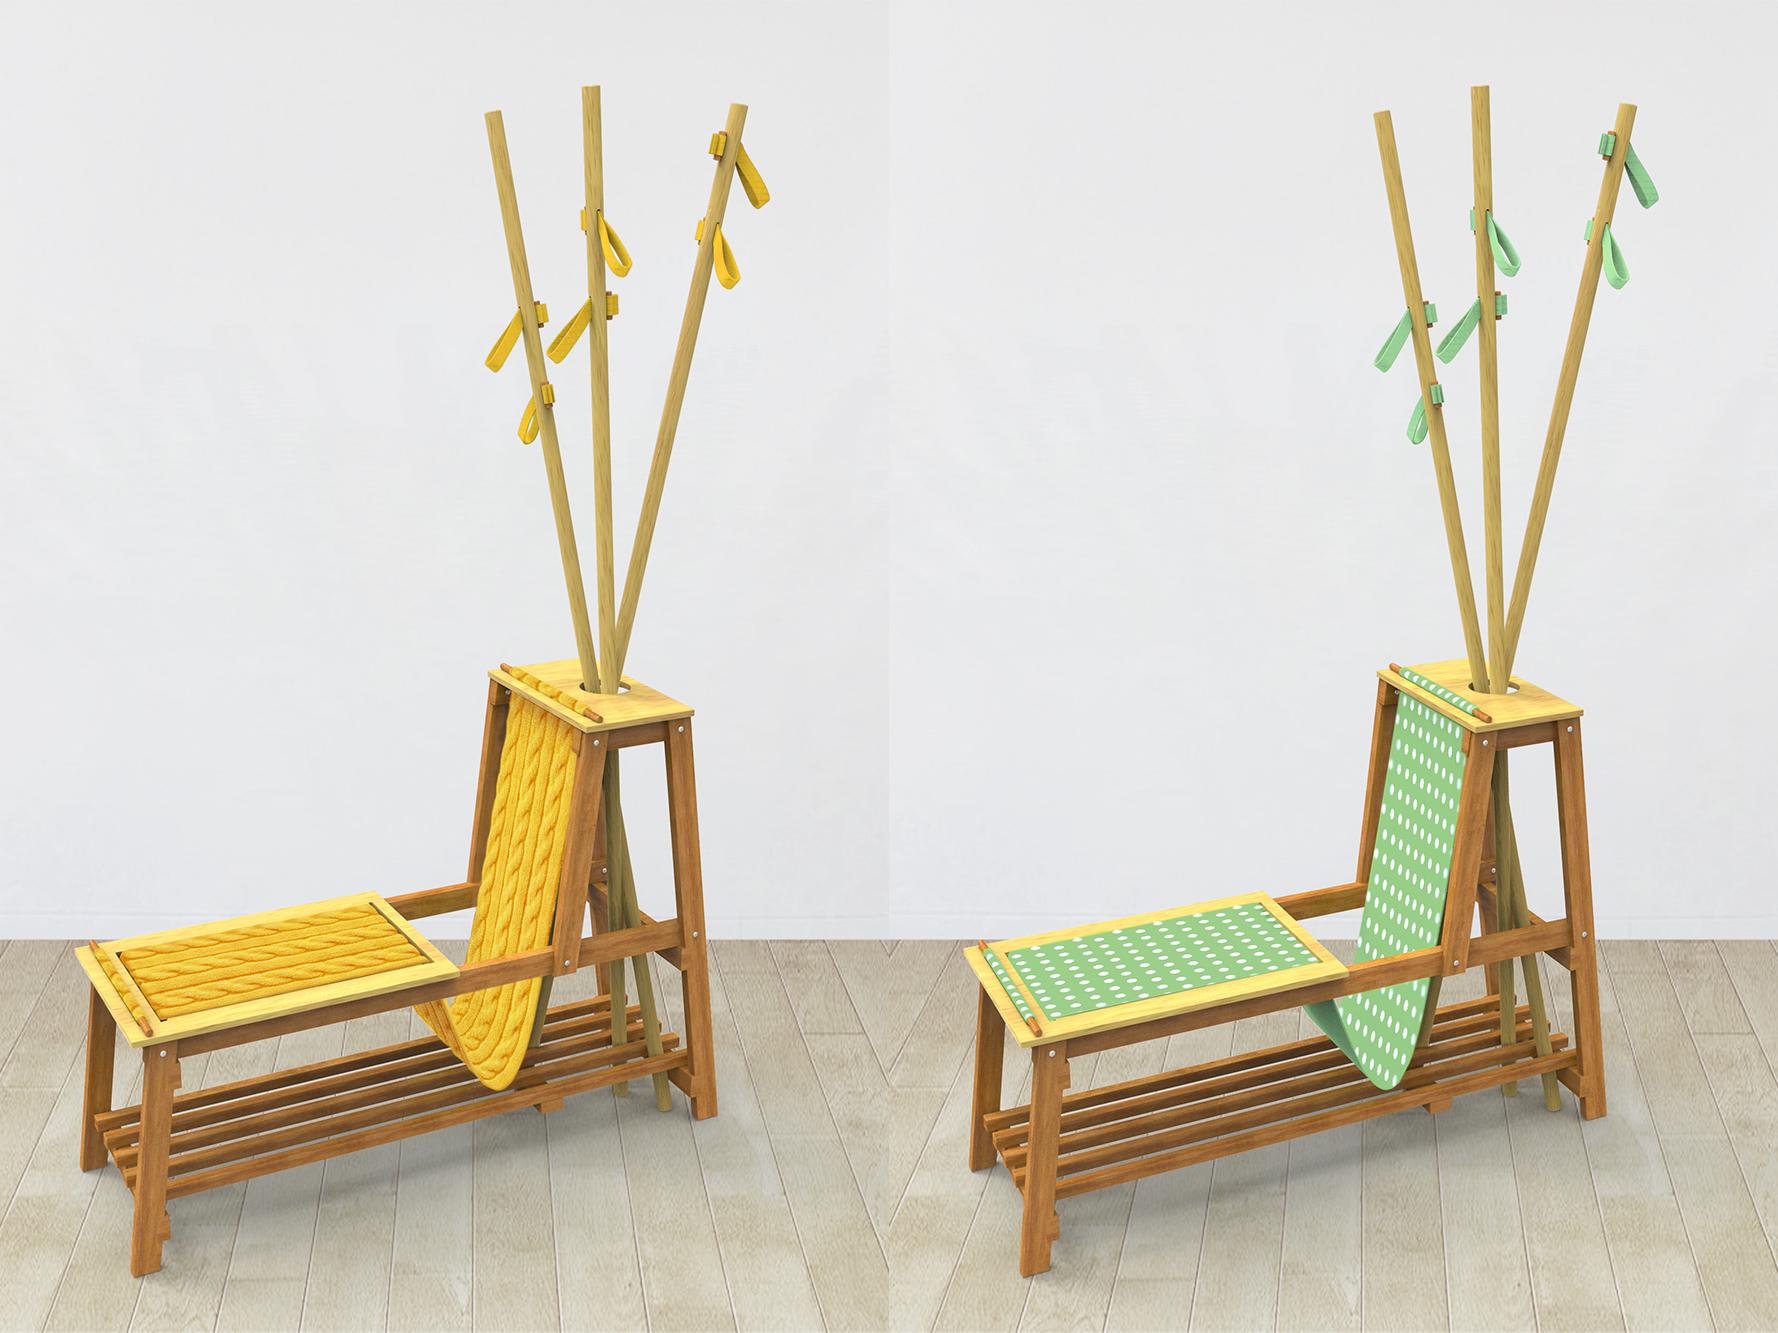 Dezső Ilona - Download Design - Bench with hanger 05.jpg